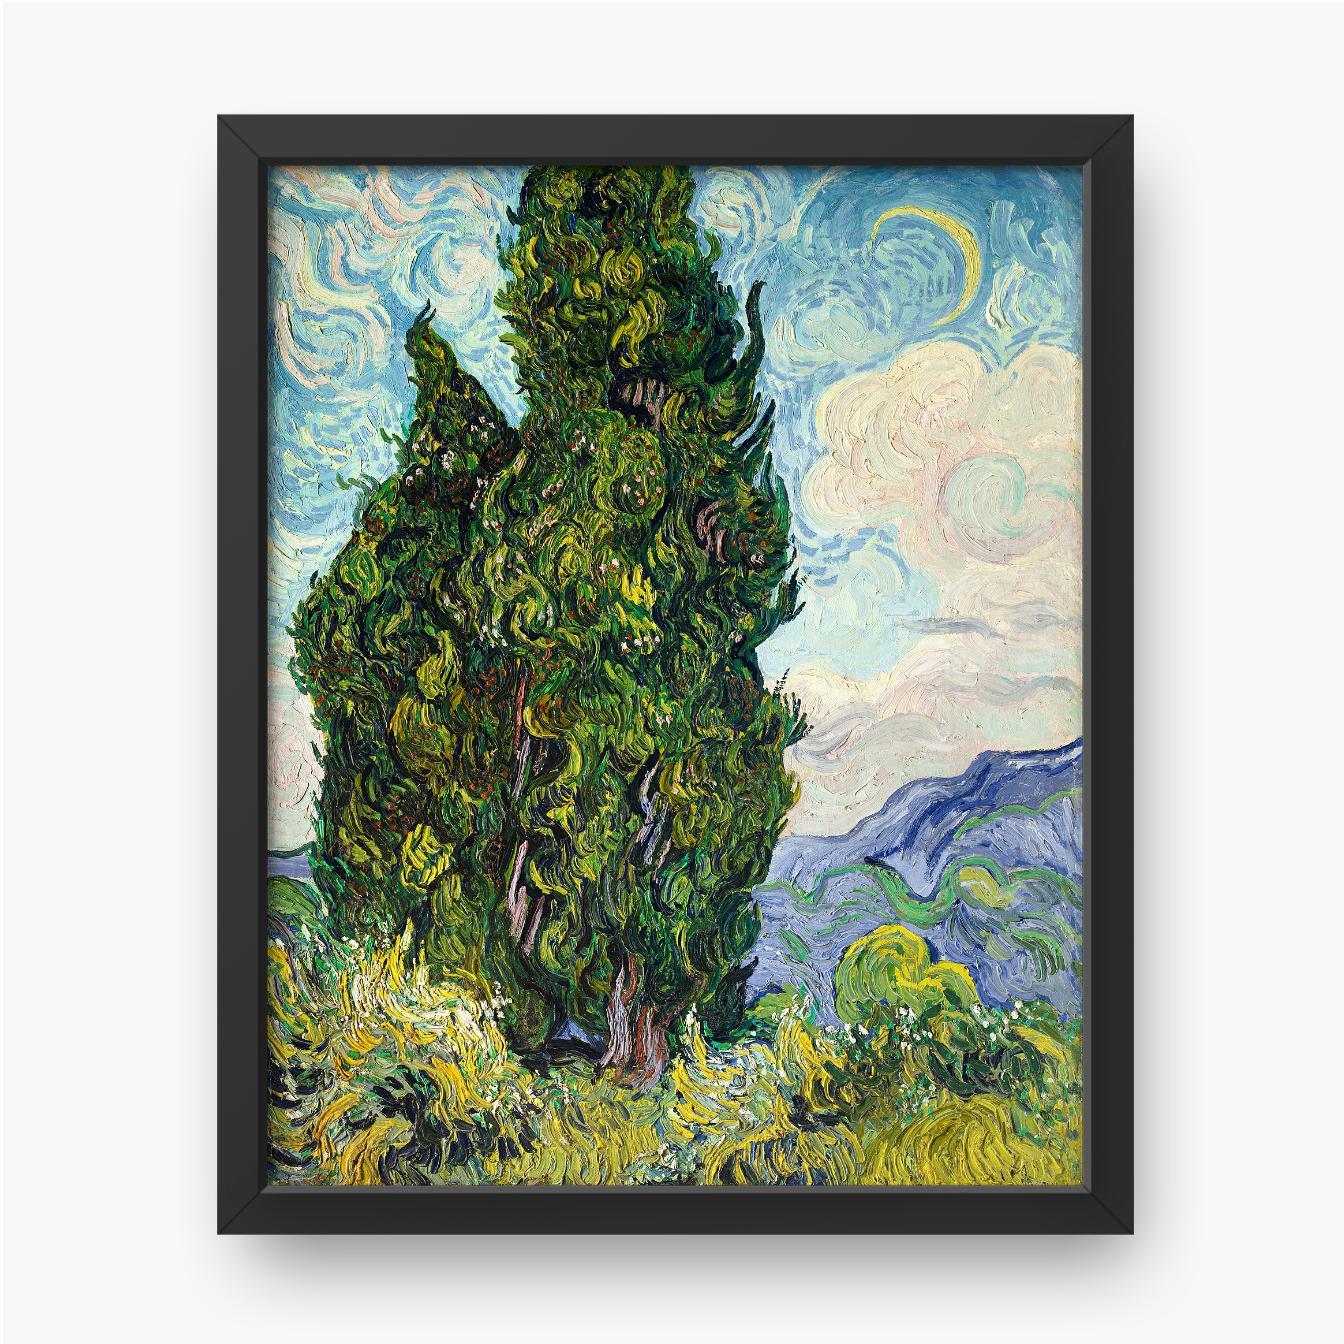 Vincent van Gogh, Cyprysy, 1889